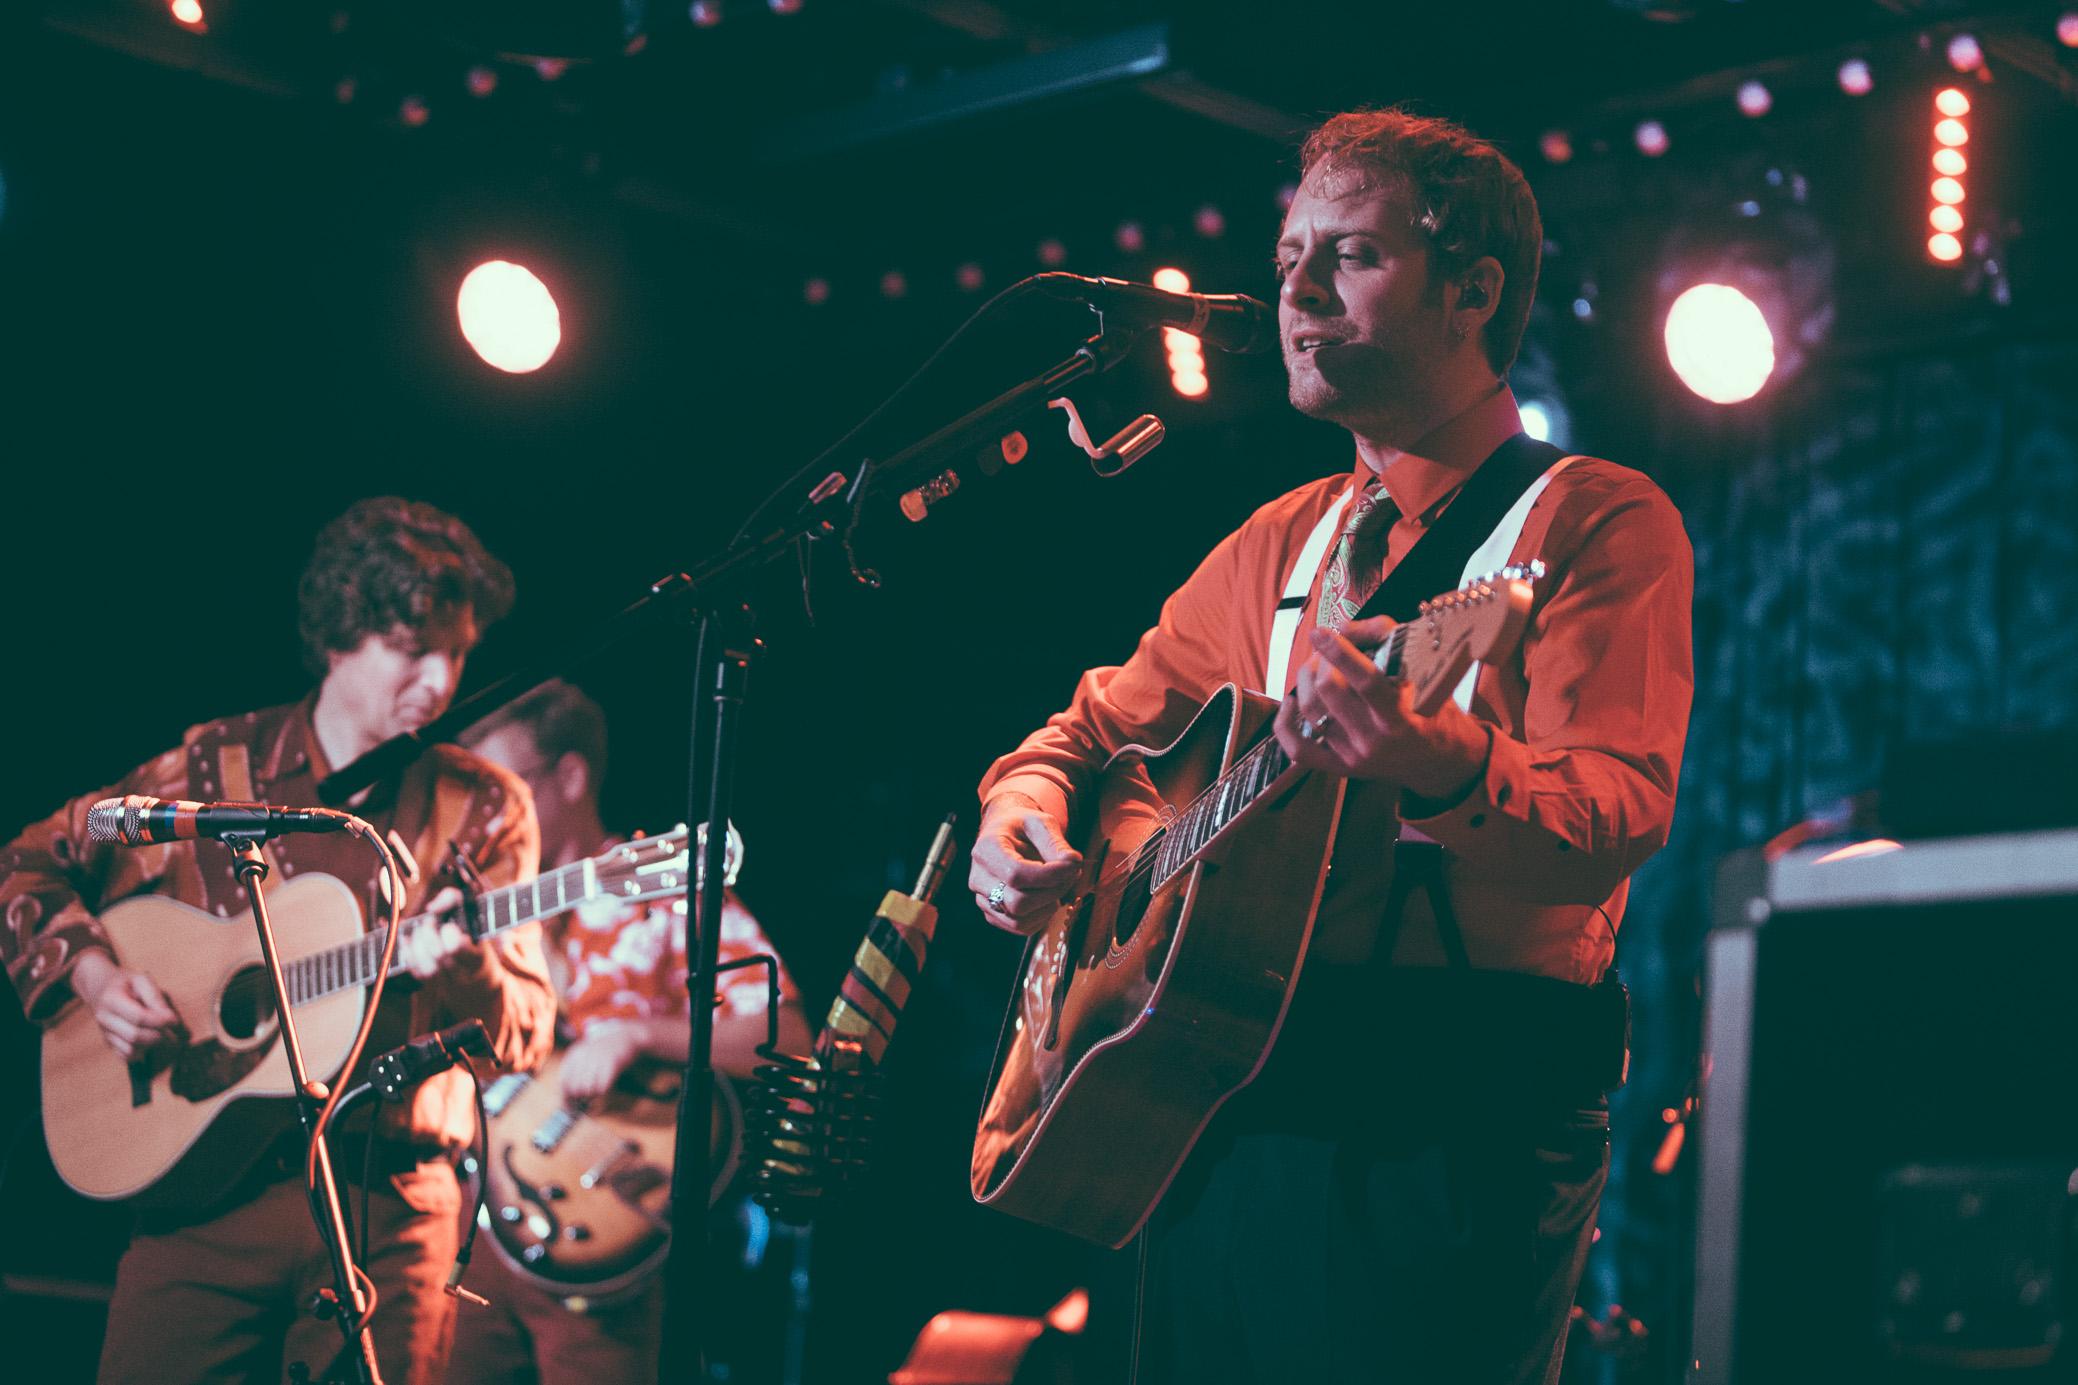 John McCauley of Deer Tick performs in concert at Saturn Birmingham in Birmingham, Alabama on September 17th, 2017. (Photo by David A. Smith/DSmithScenes)